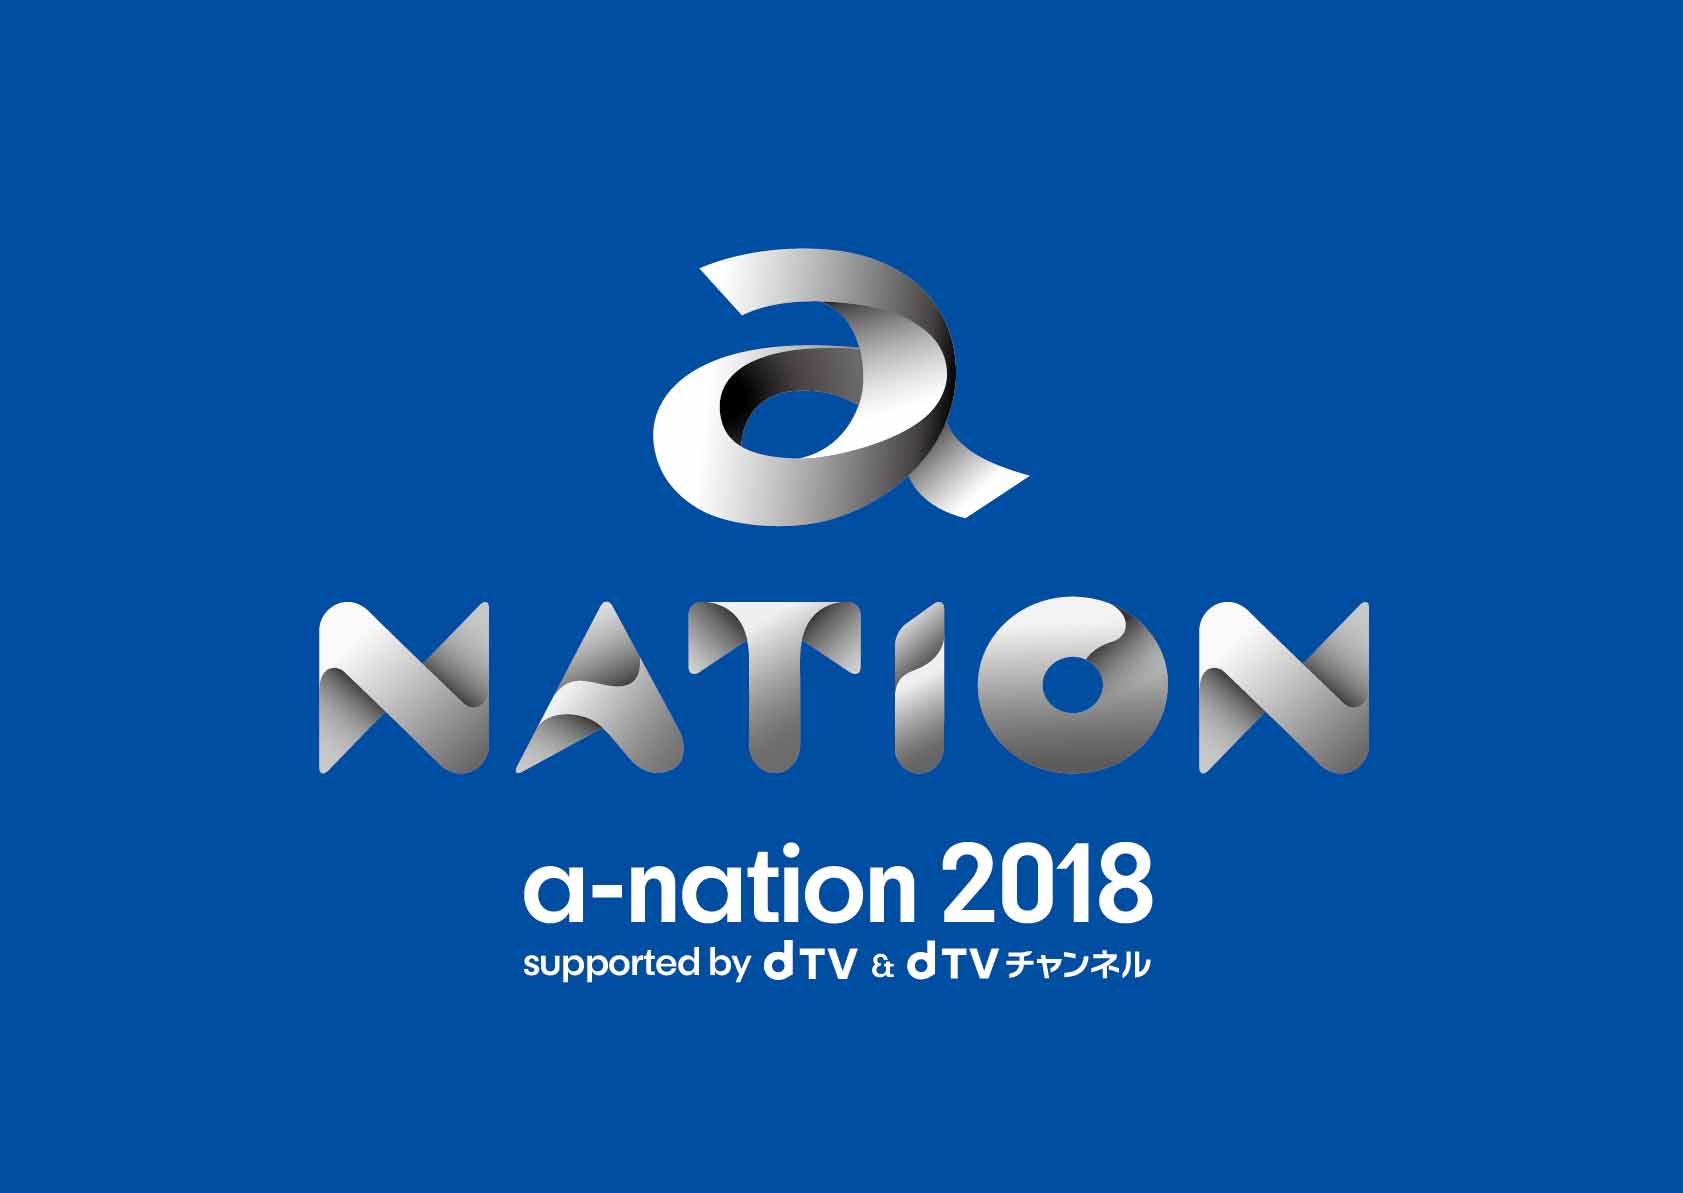 a-nation 2018 キッズルーム(託児所)8/26 (日) 東京公演